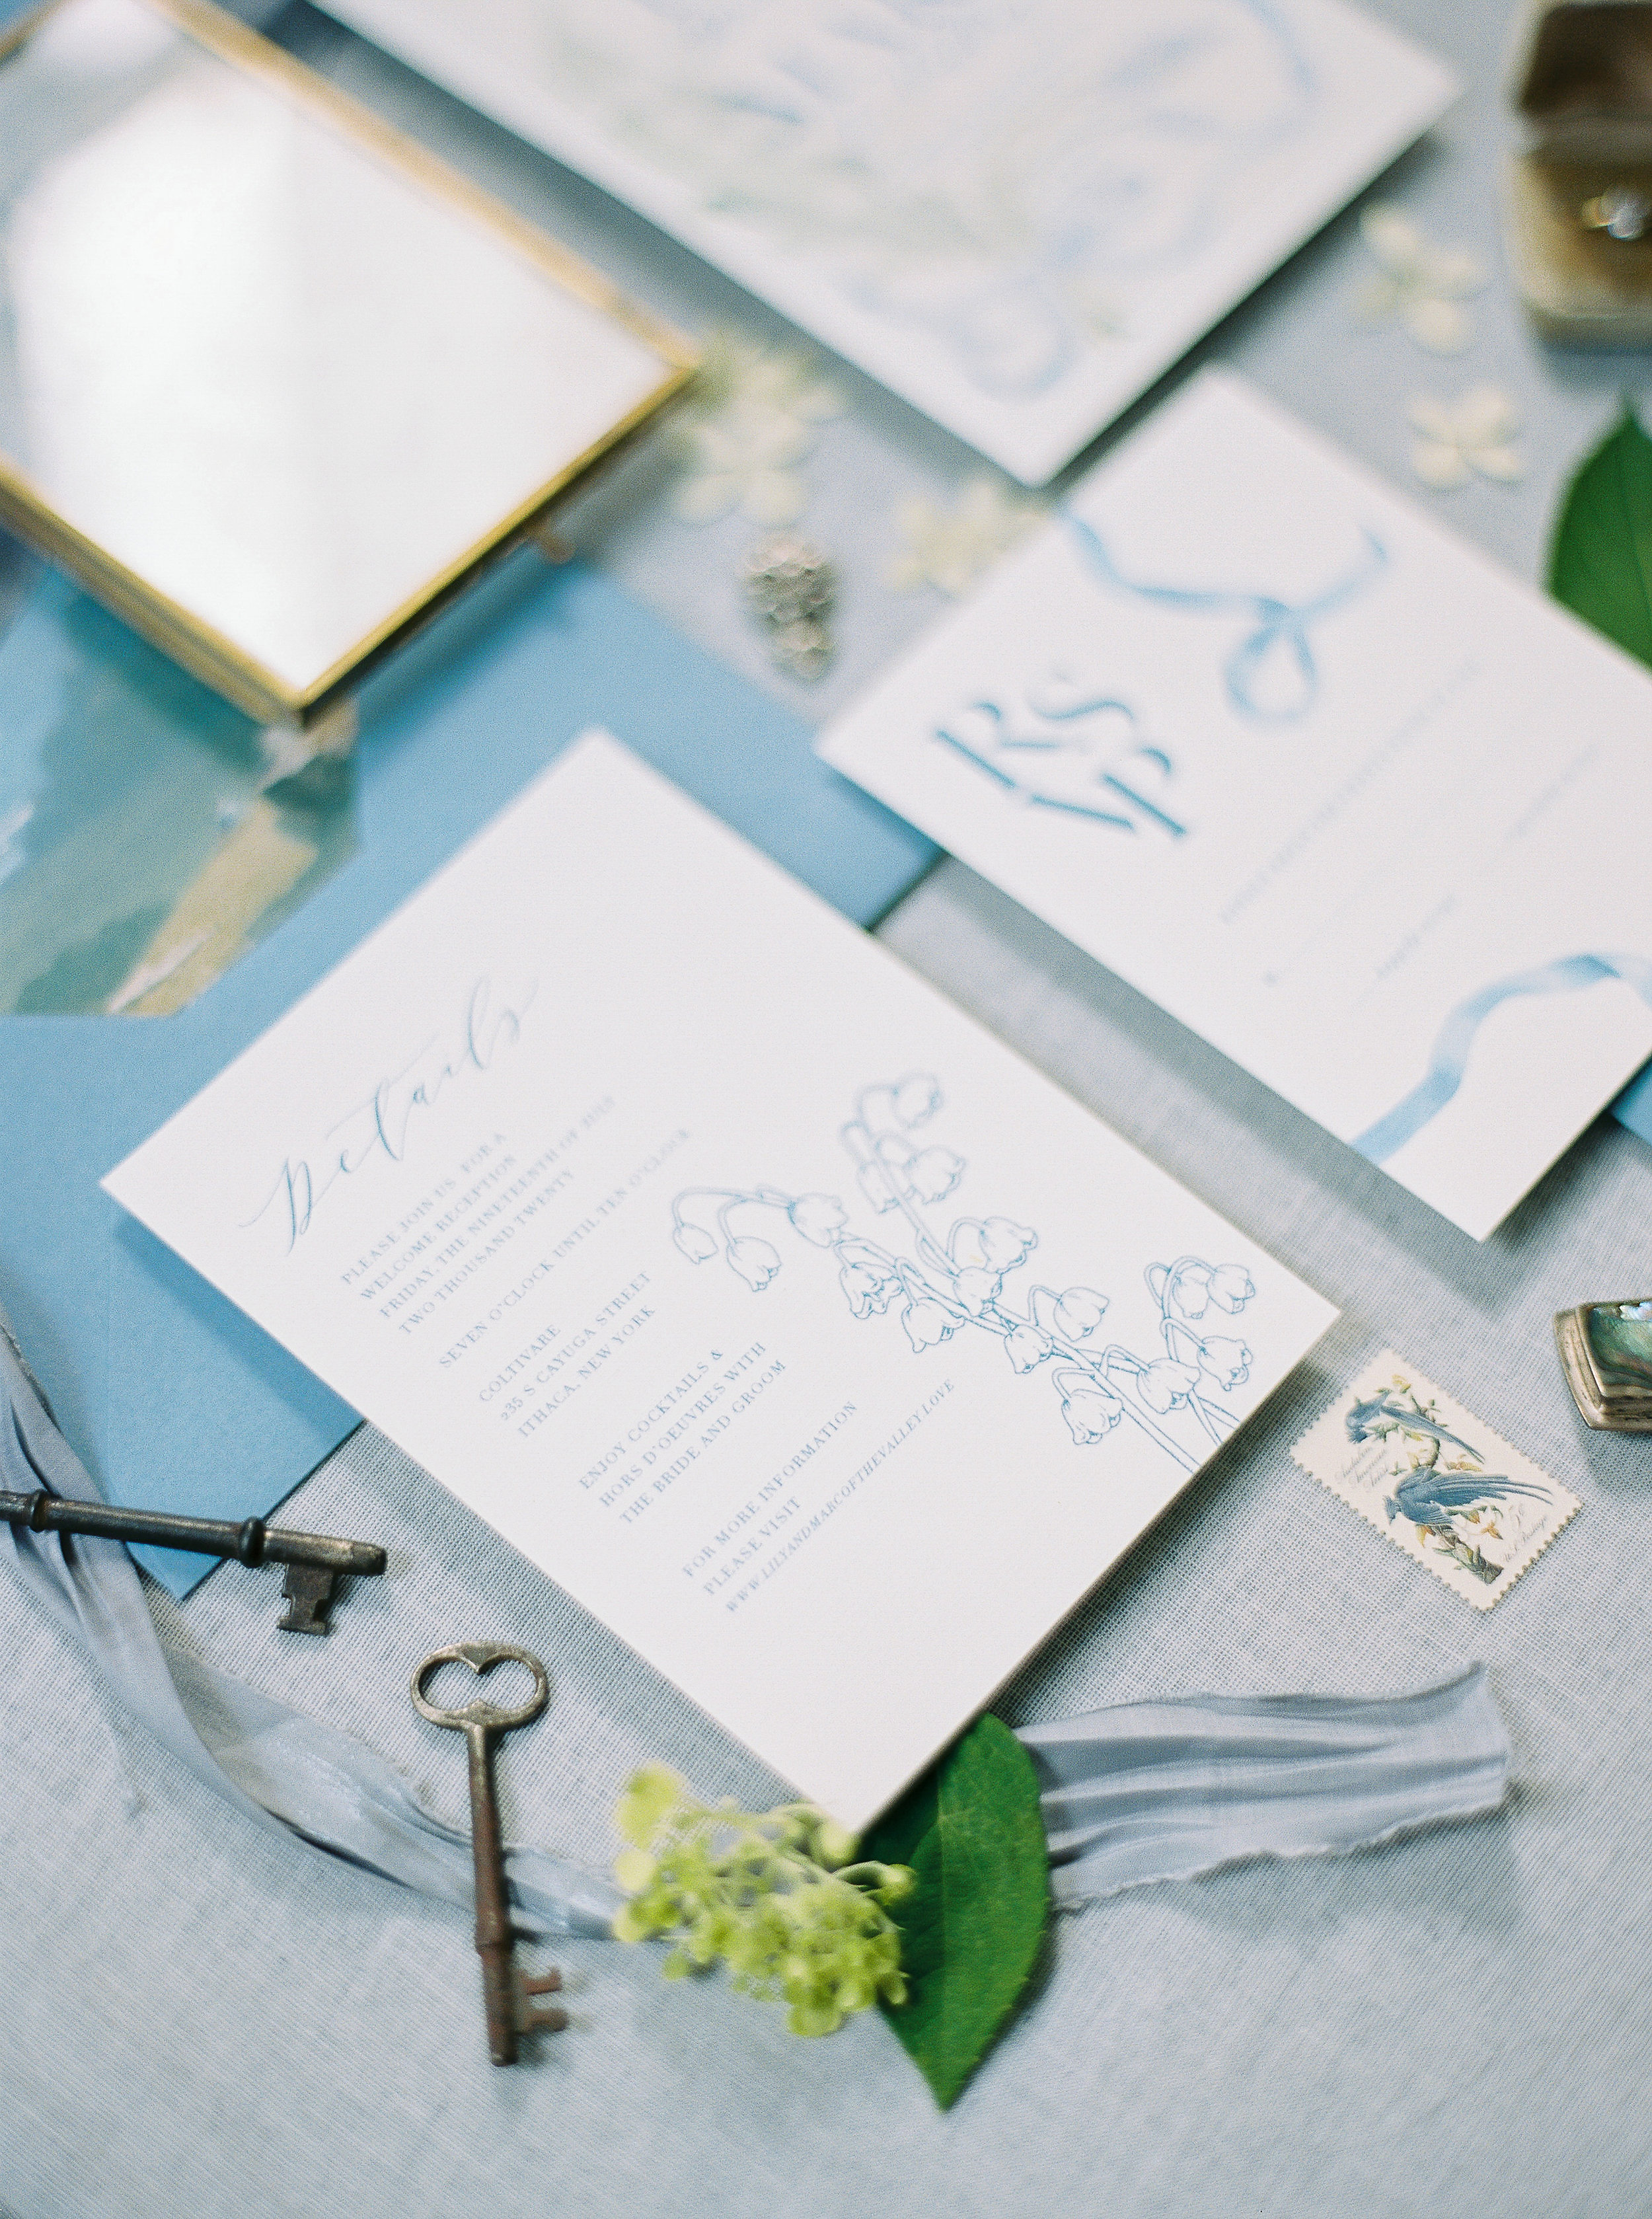 Alexandra-Elise-Photography-Film-Branding-Photographer-Rochester-New-York-Stone-Fruit-Studio-Wedding-Invitations-025.jpg